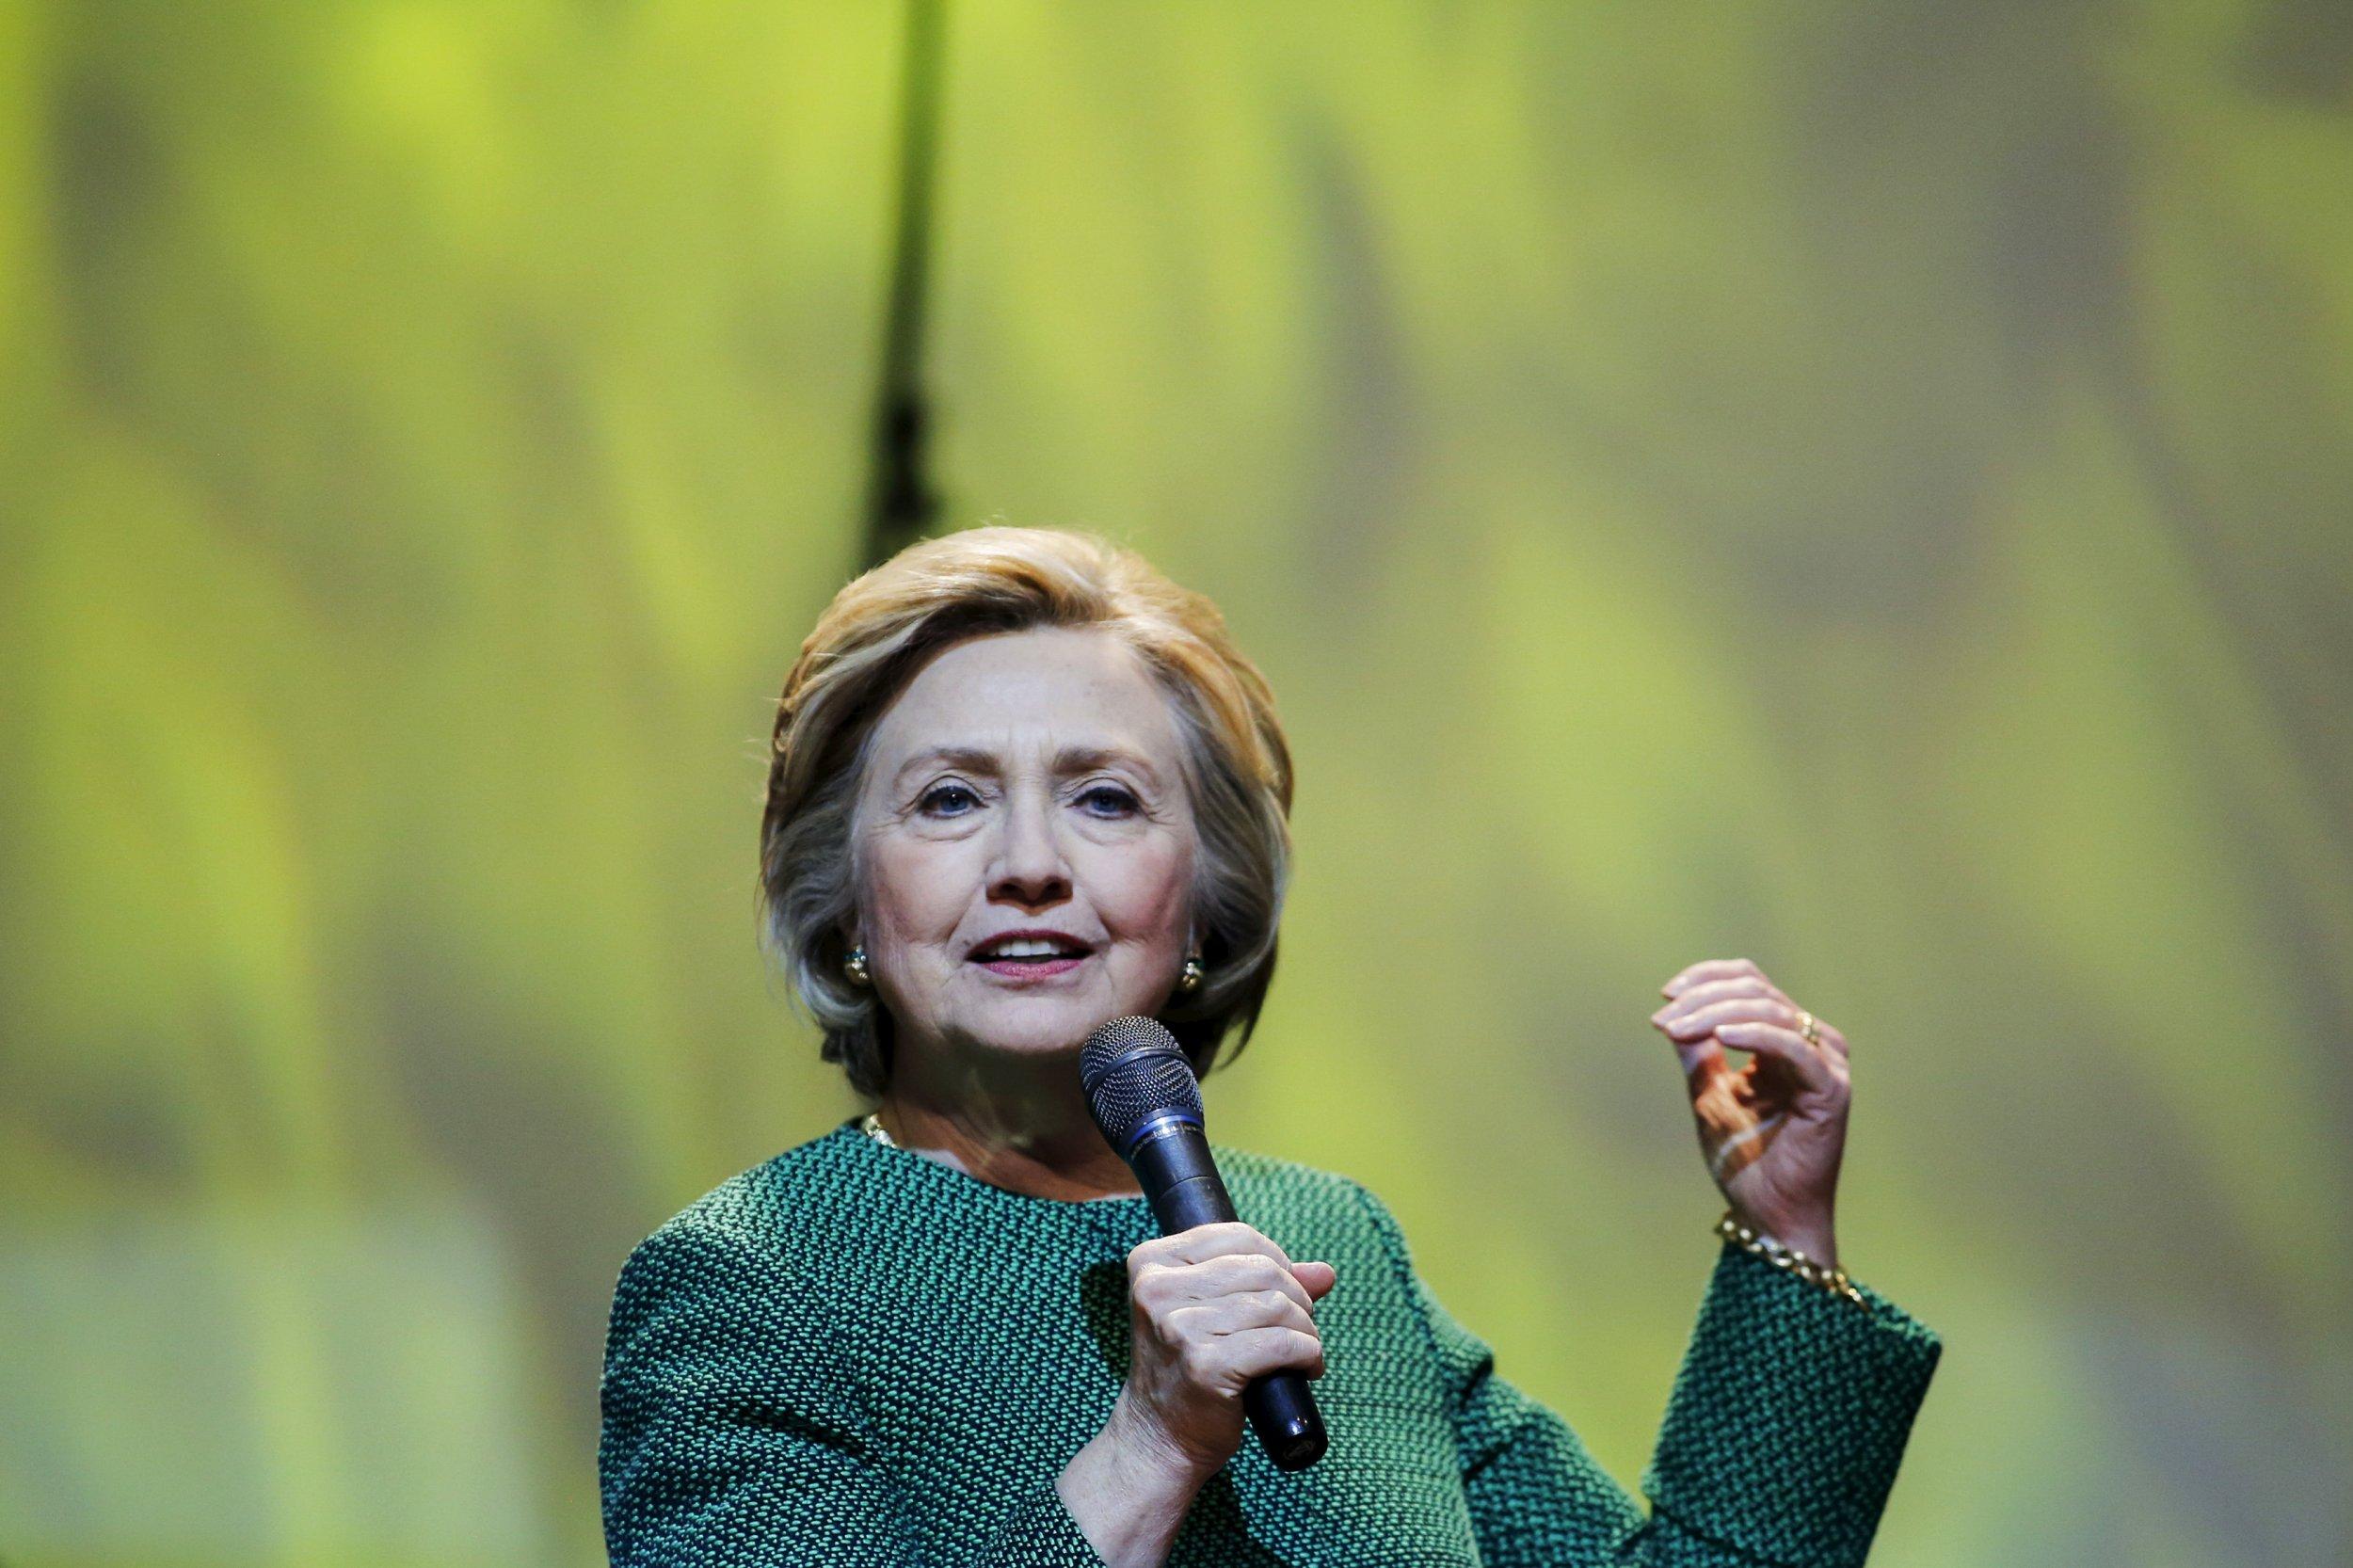 04_11_Hillary_Clinton_01